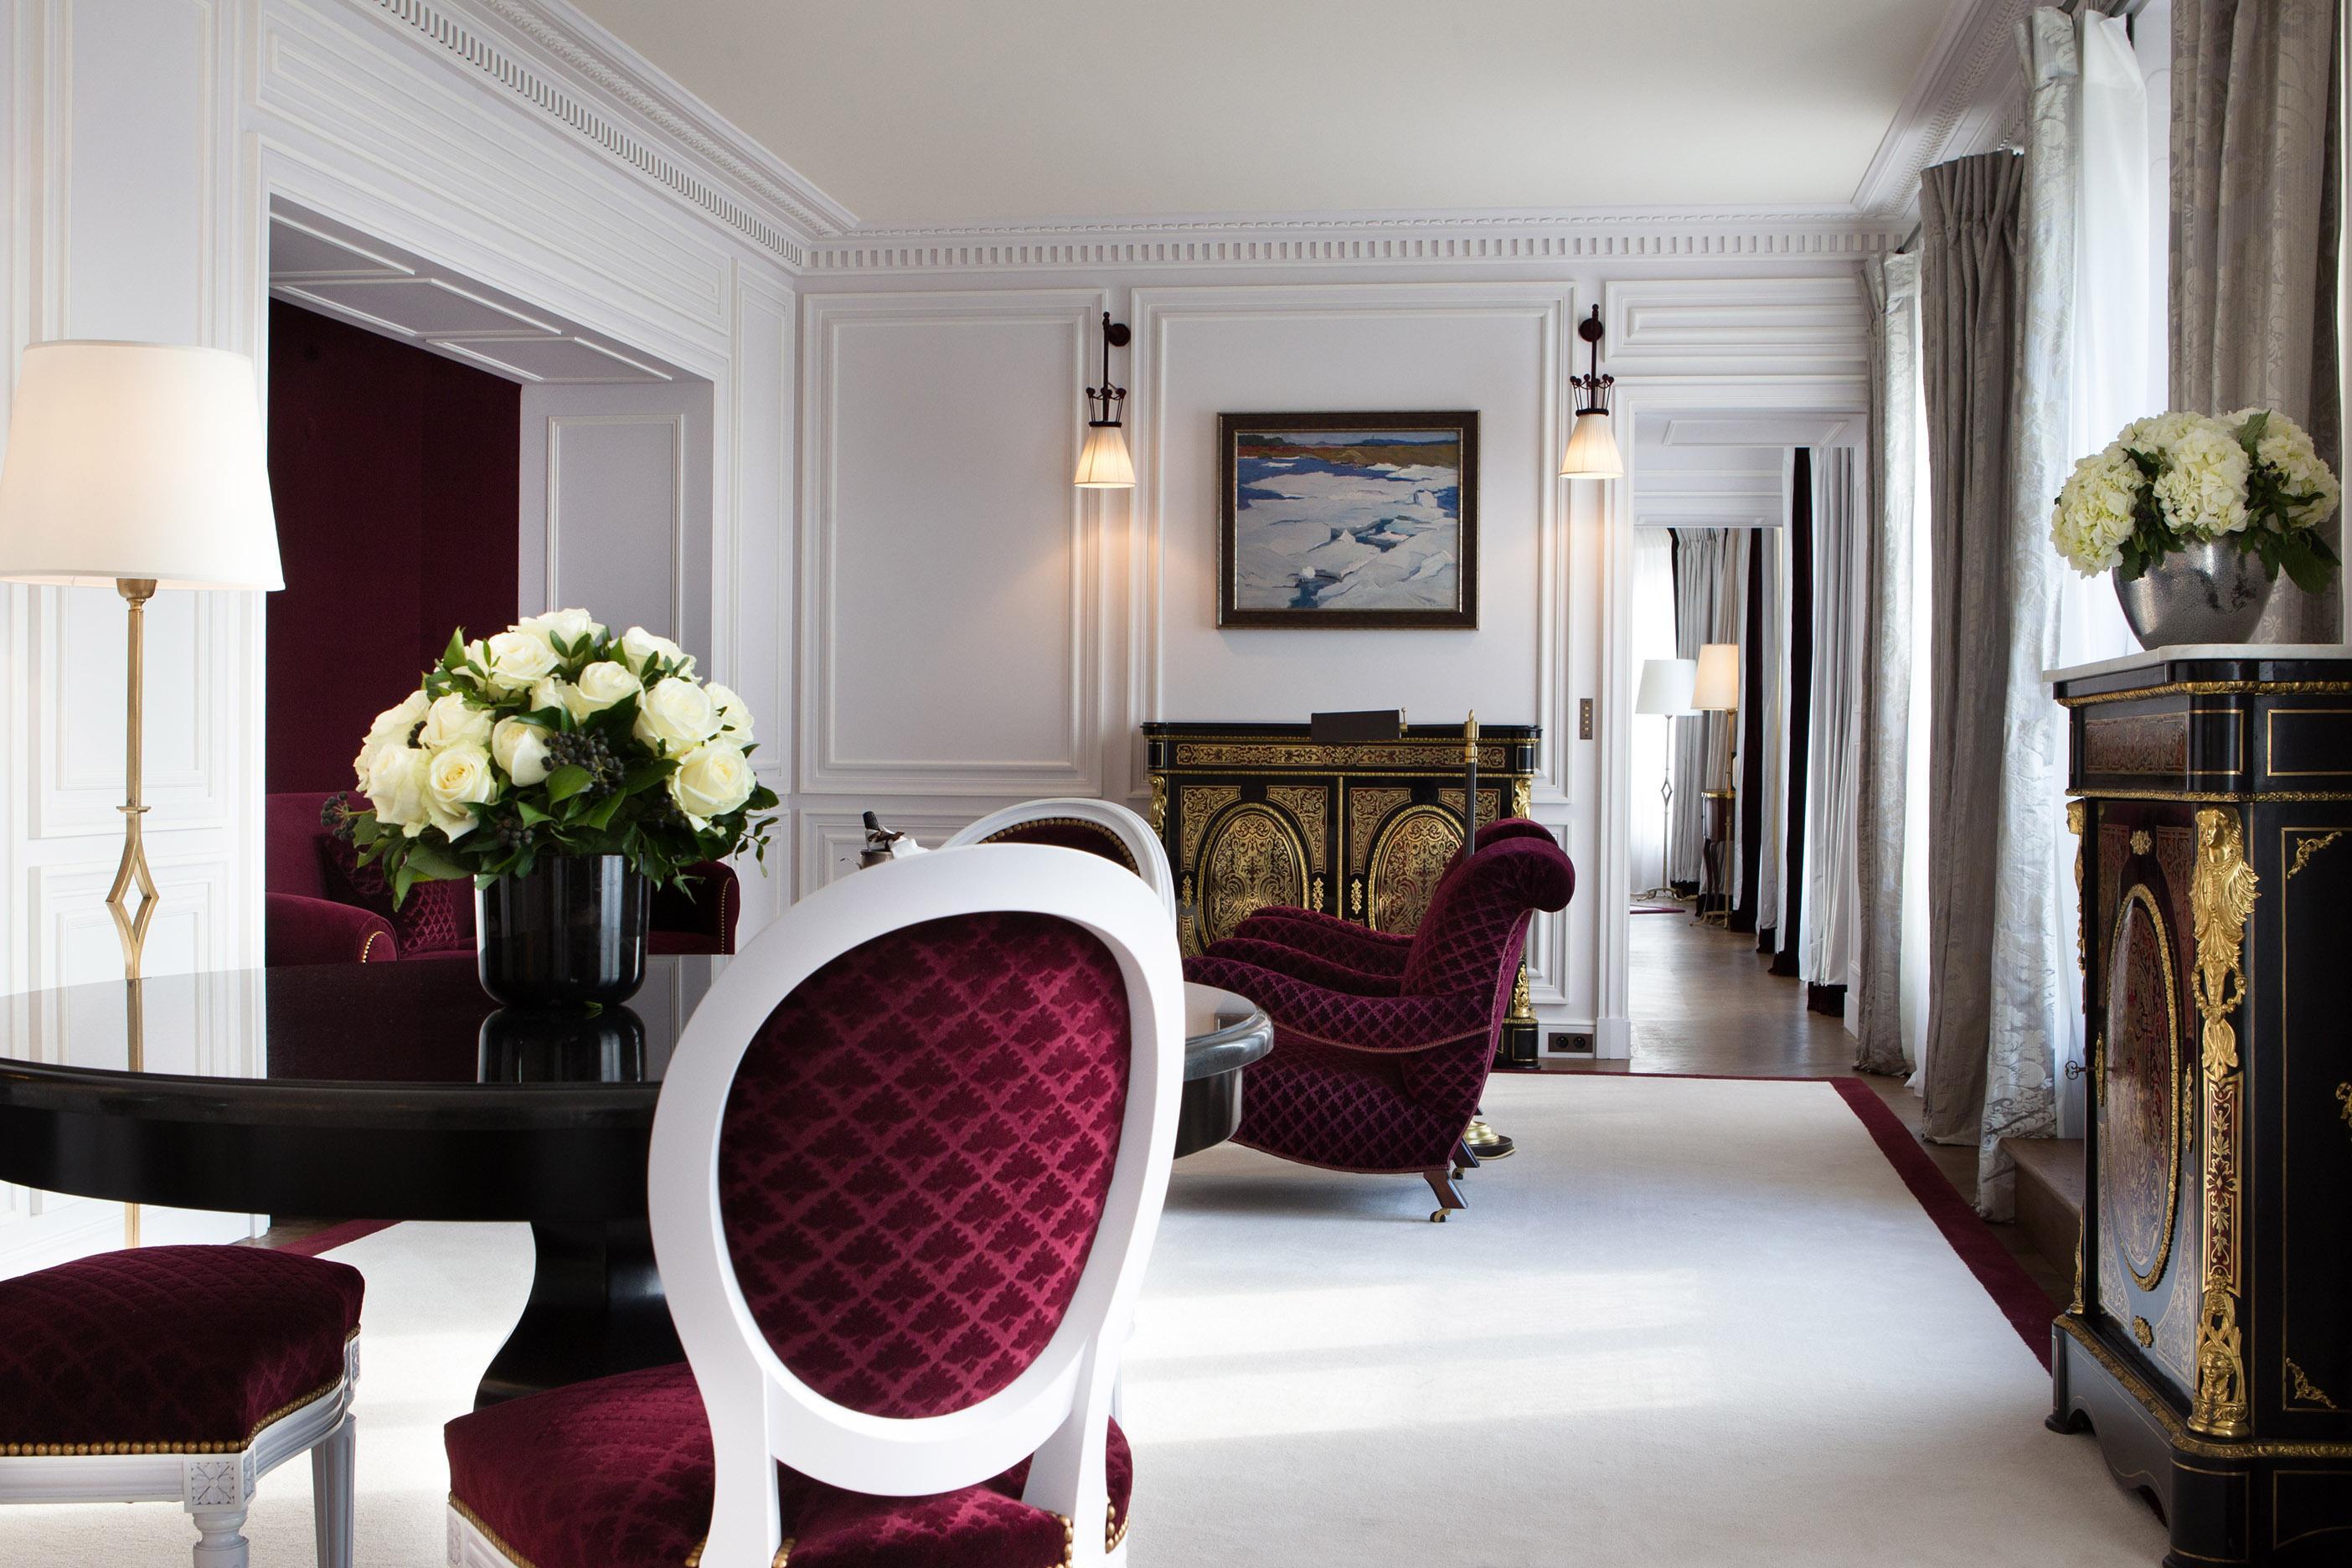 La Reserve Paris - Hotel and Spa